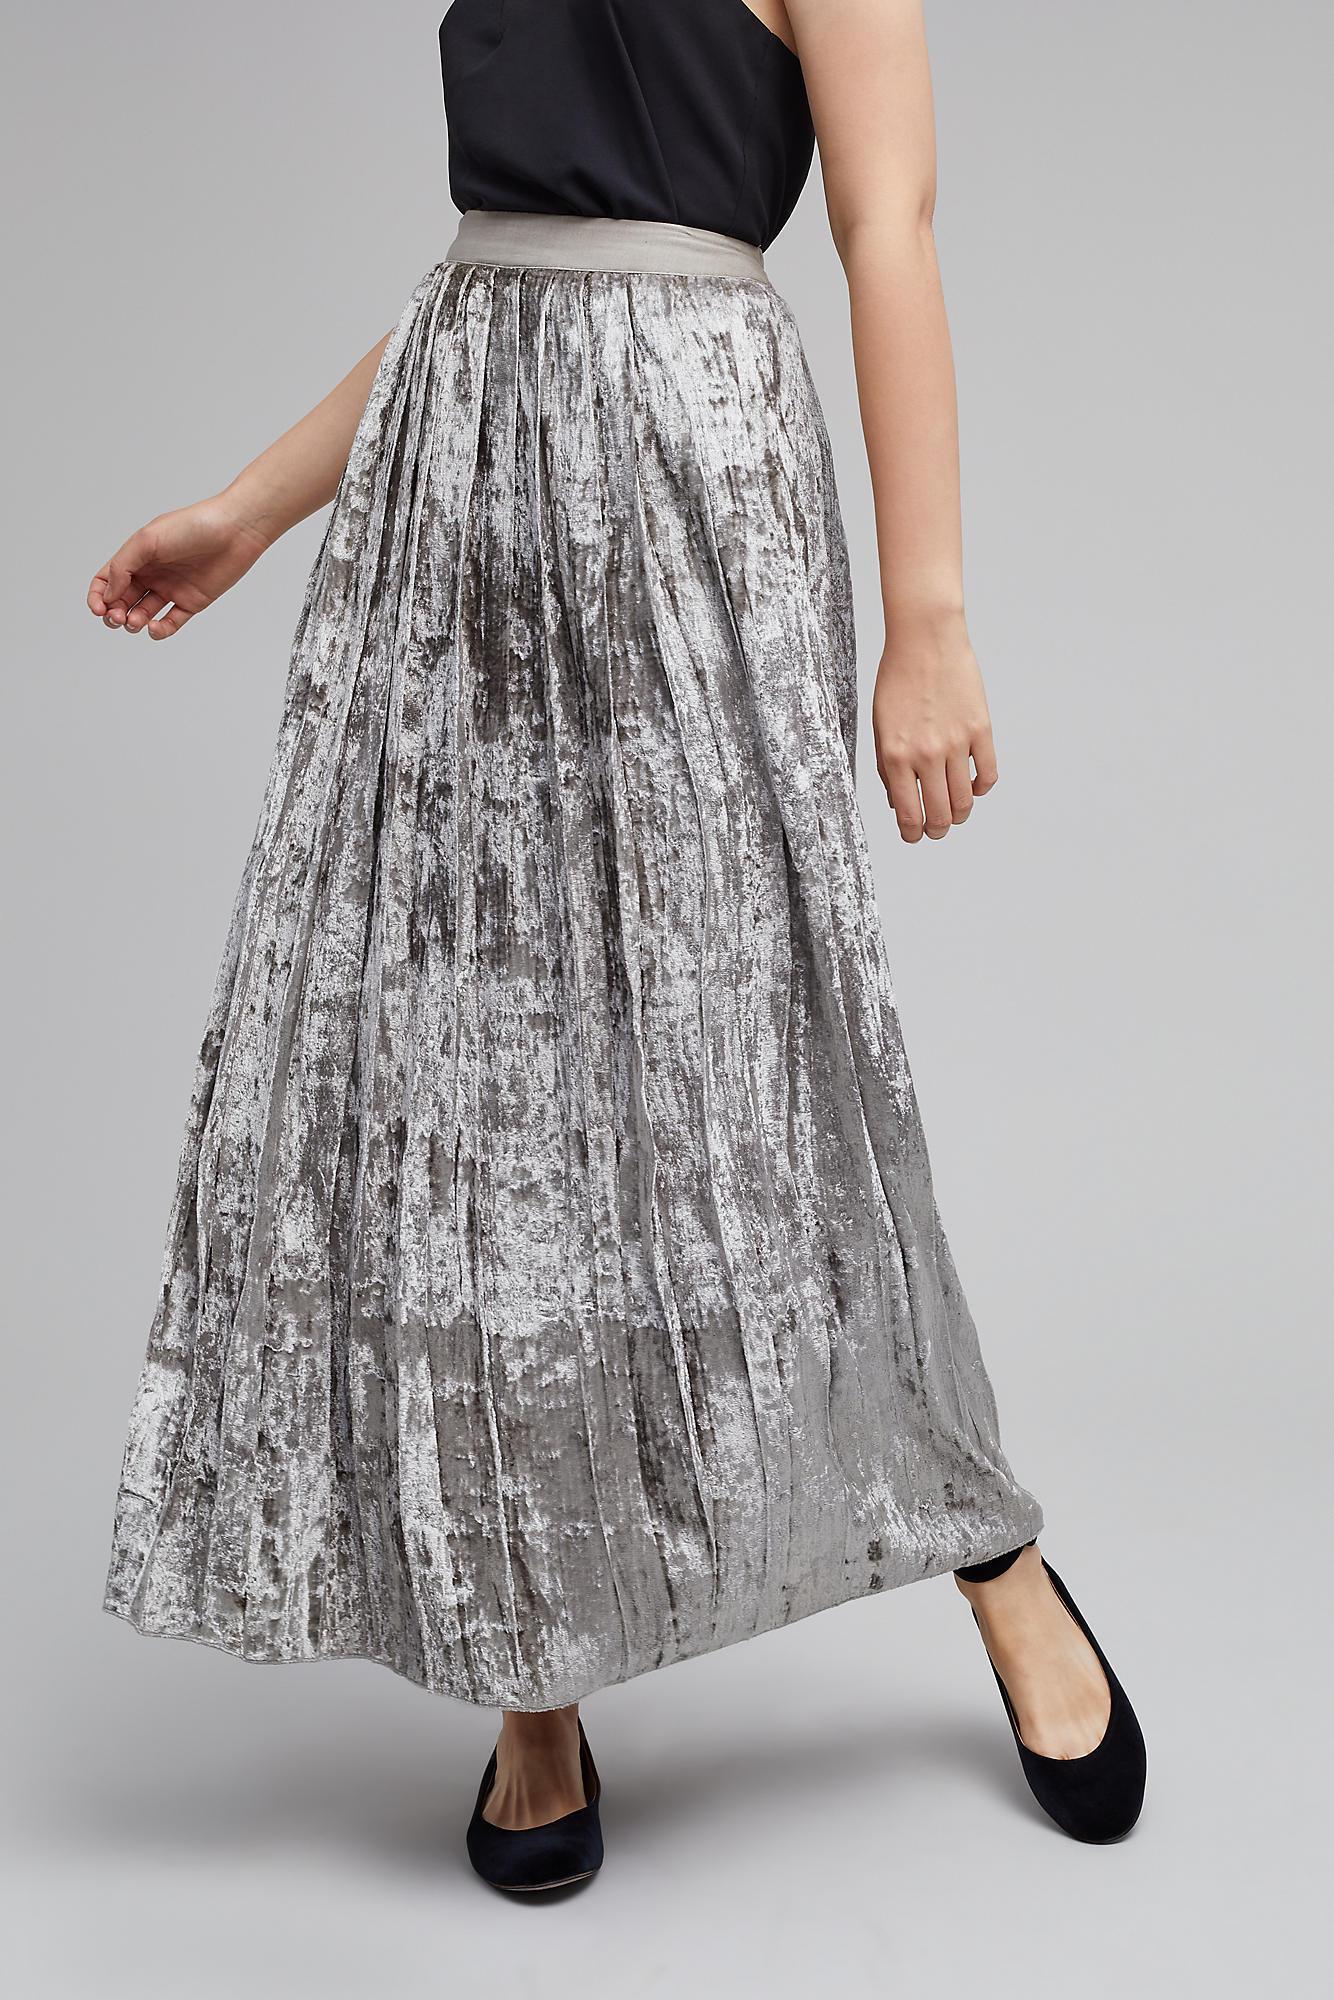 Women S Clothing Ladies Metallic Shiny Pleated Skirt Velvet A Line Shimmer Accordion Maxi Skirt Puebla Tecnm Mx